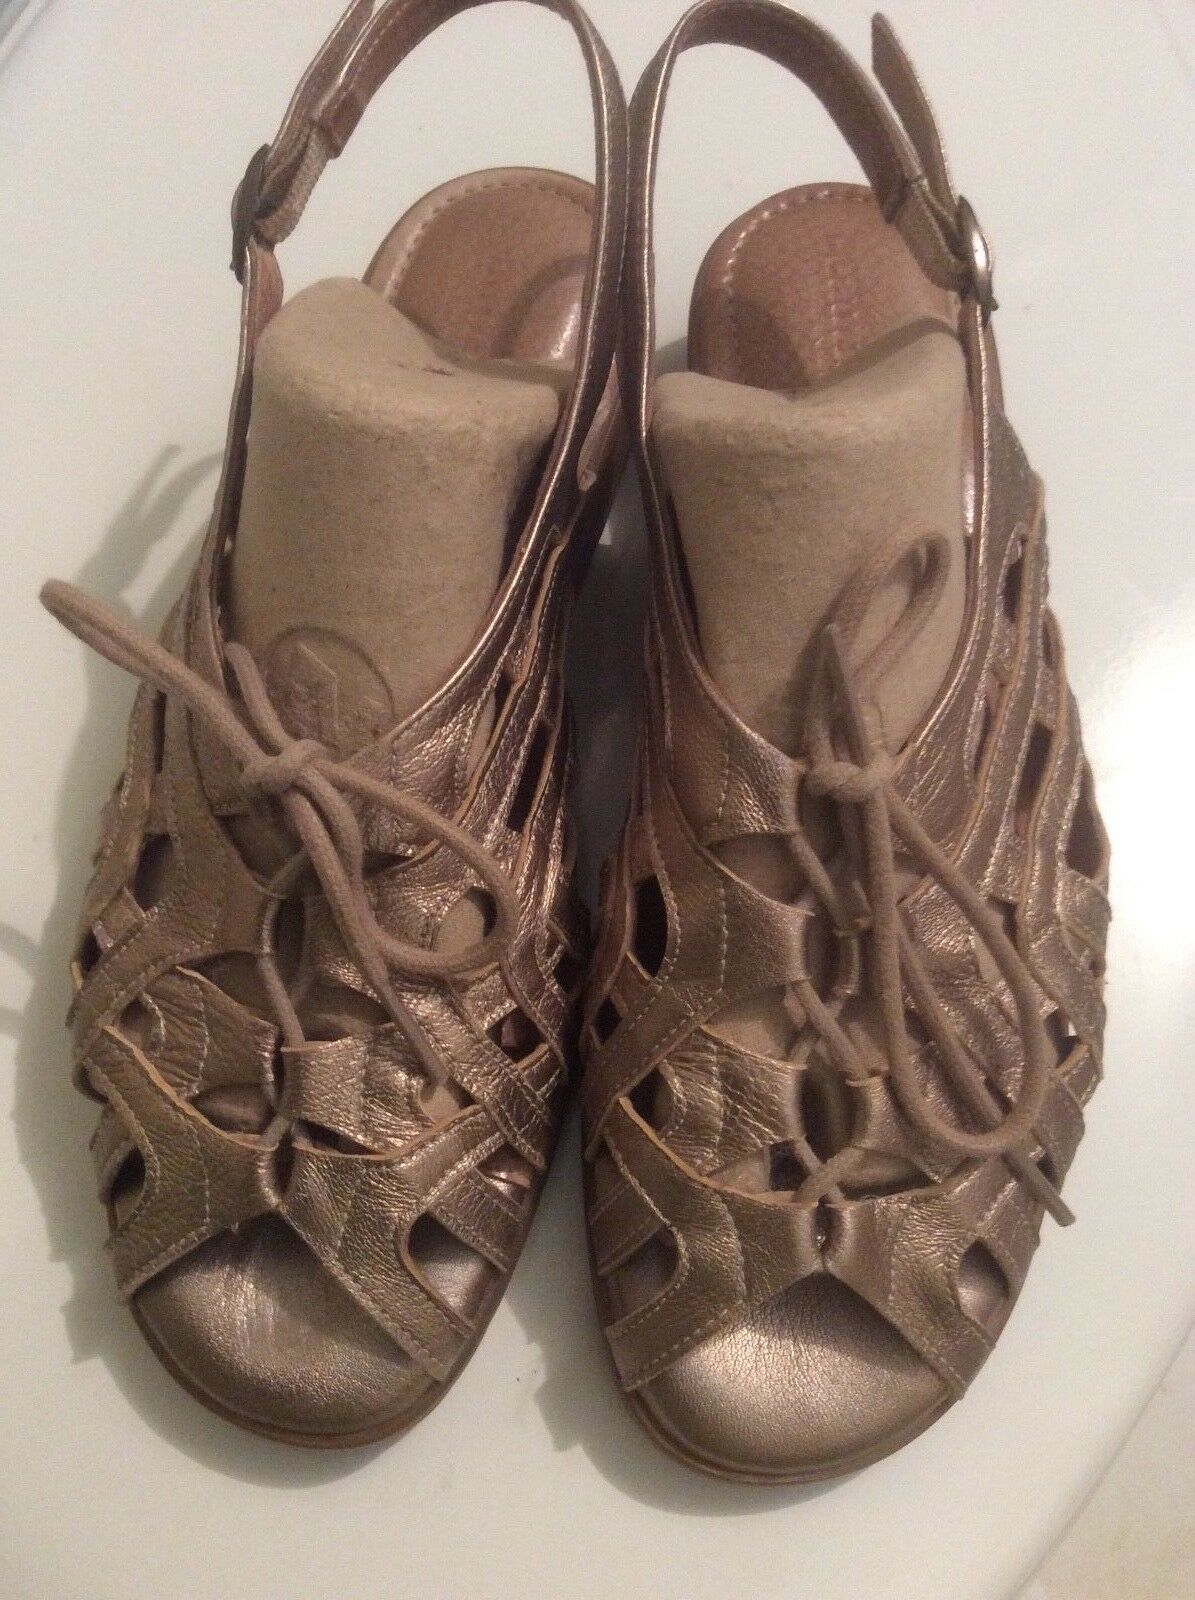 Beauti Feel Woman sandals comfort metallic Sz 37 Shock Absober made in Israel